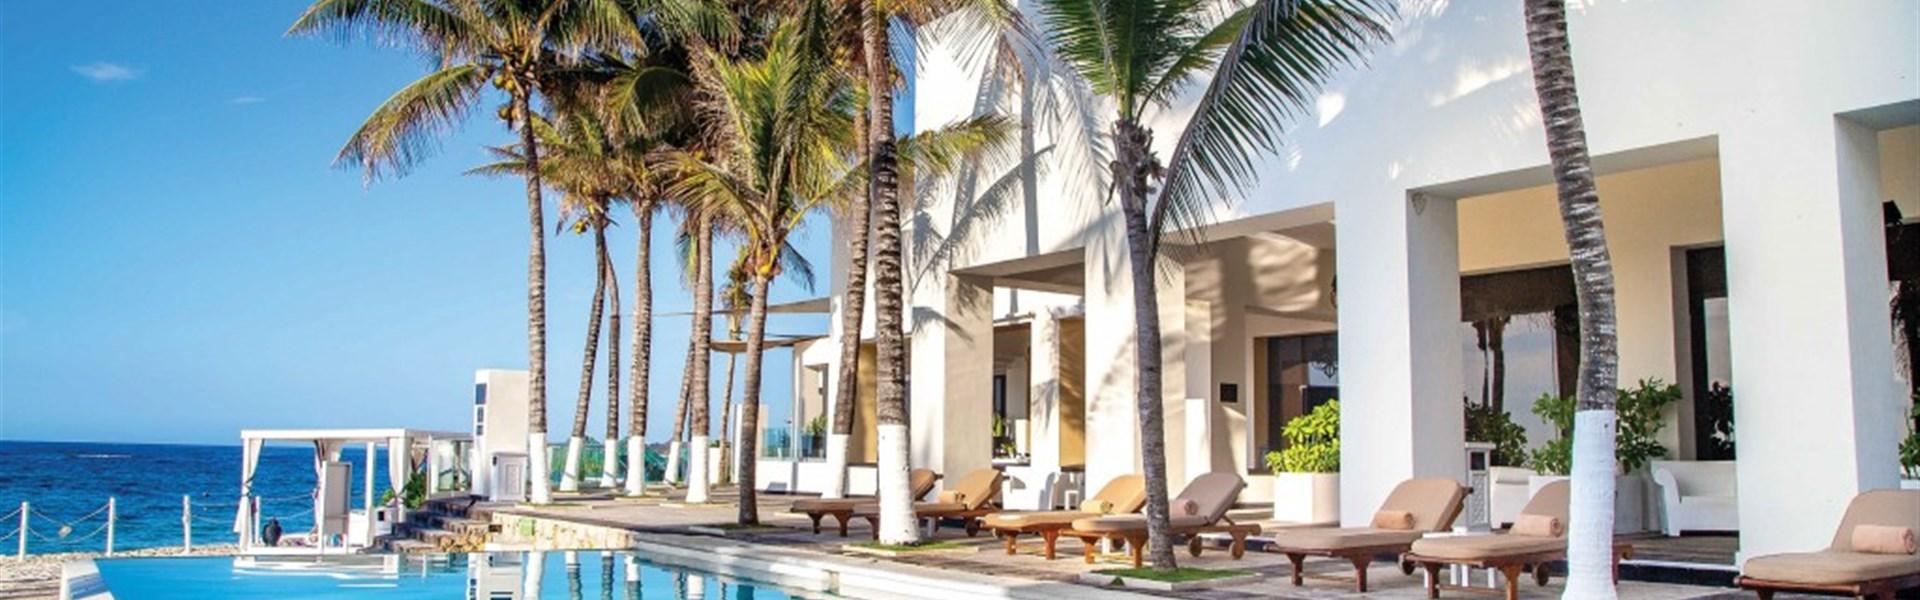 Marco Polo - Sunscape Akumal Beach Resort and Spa -